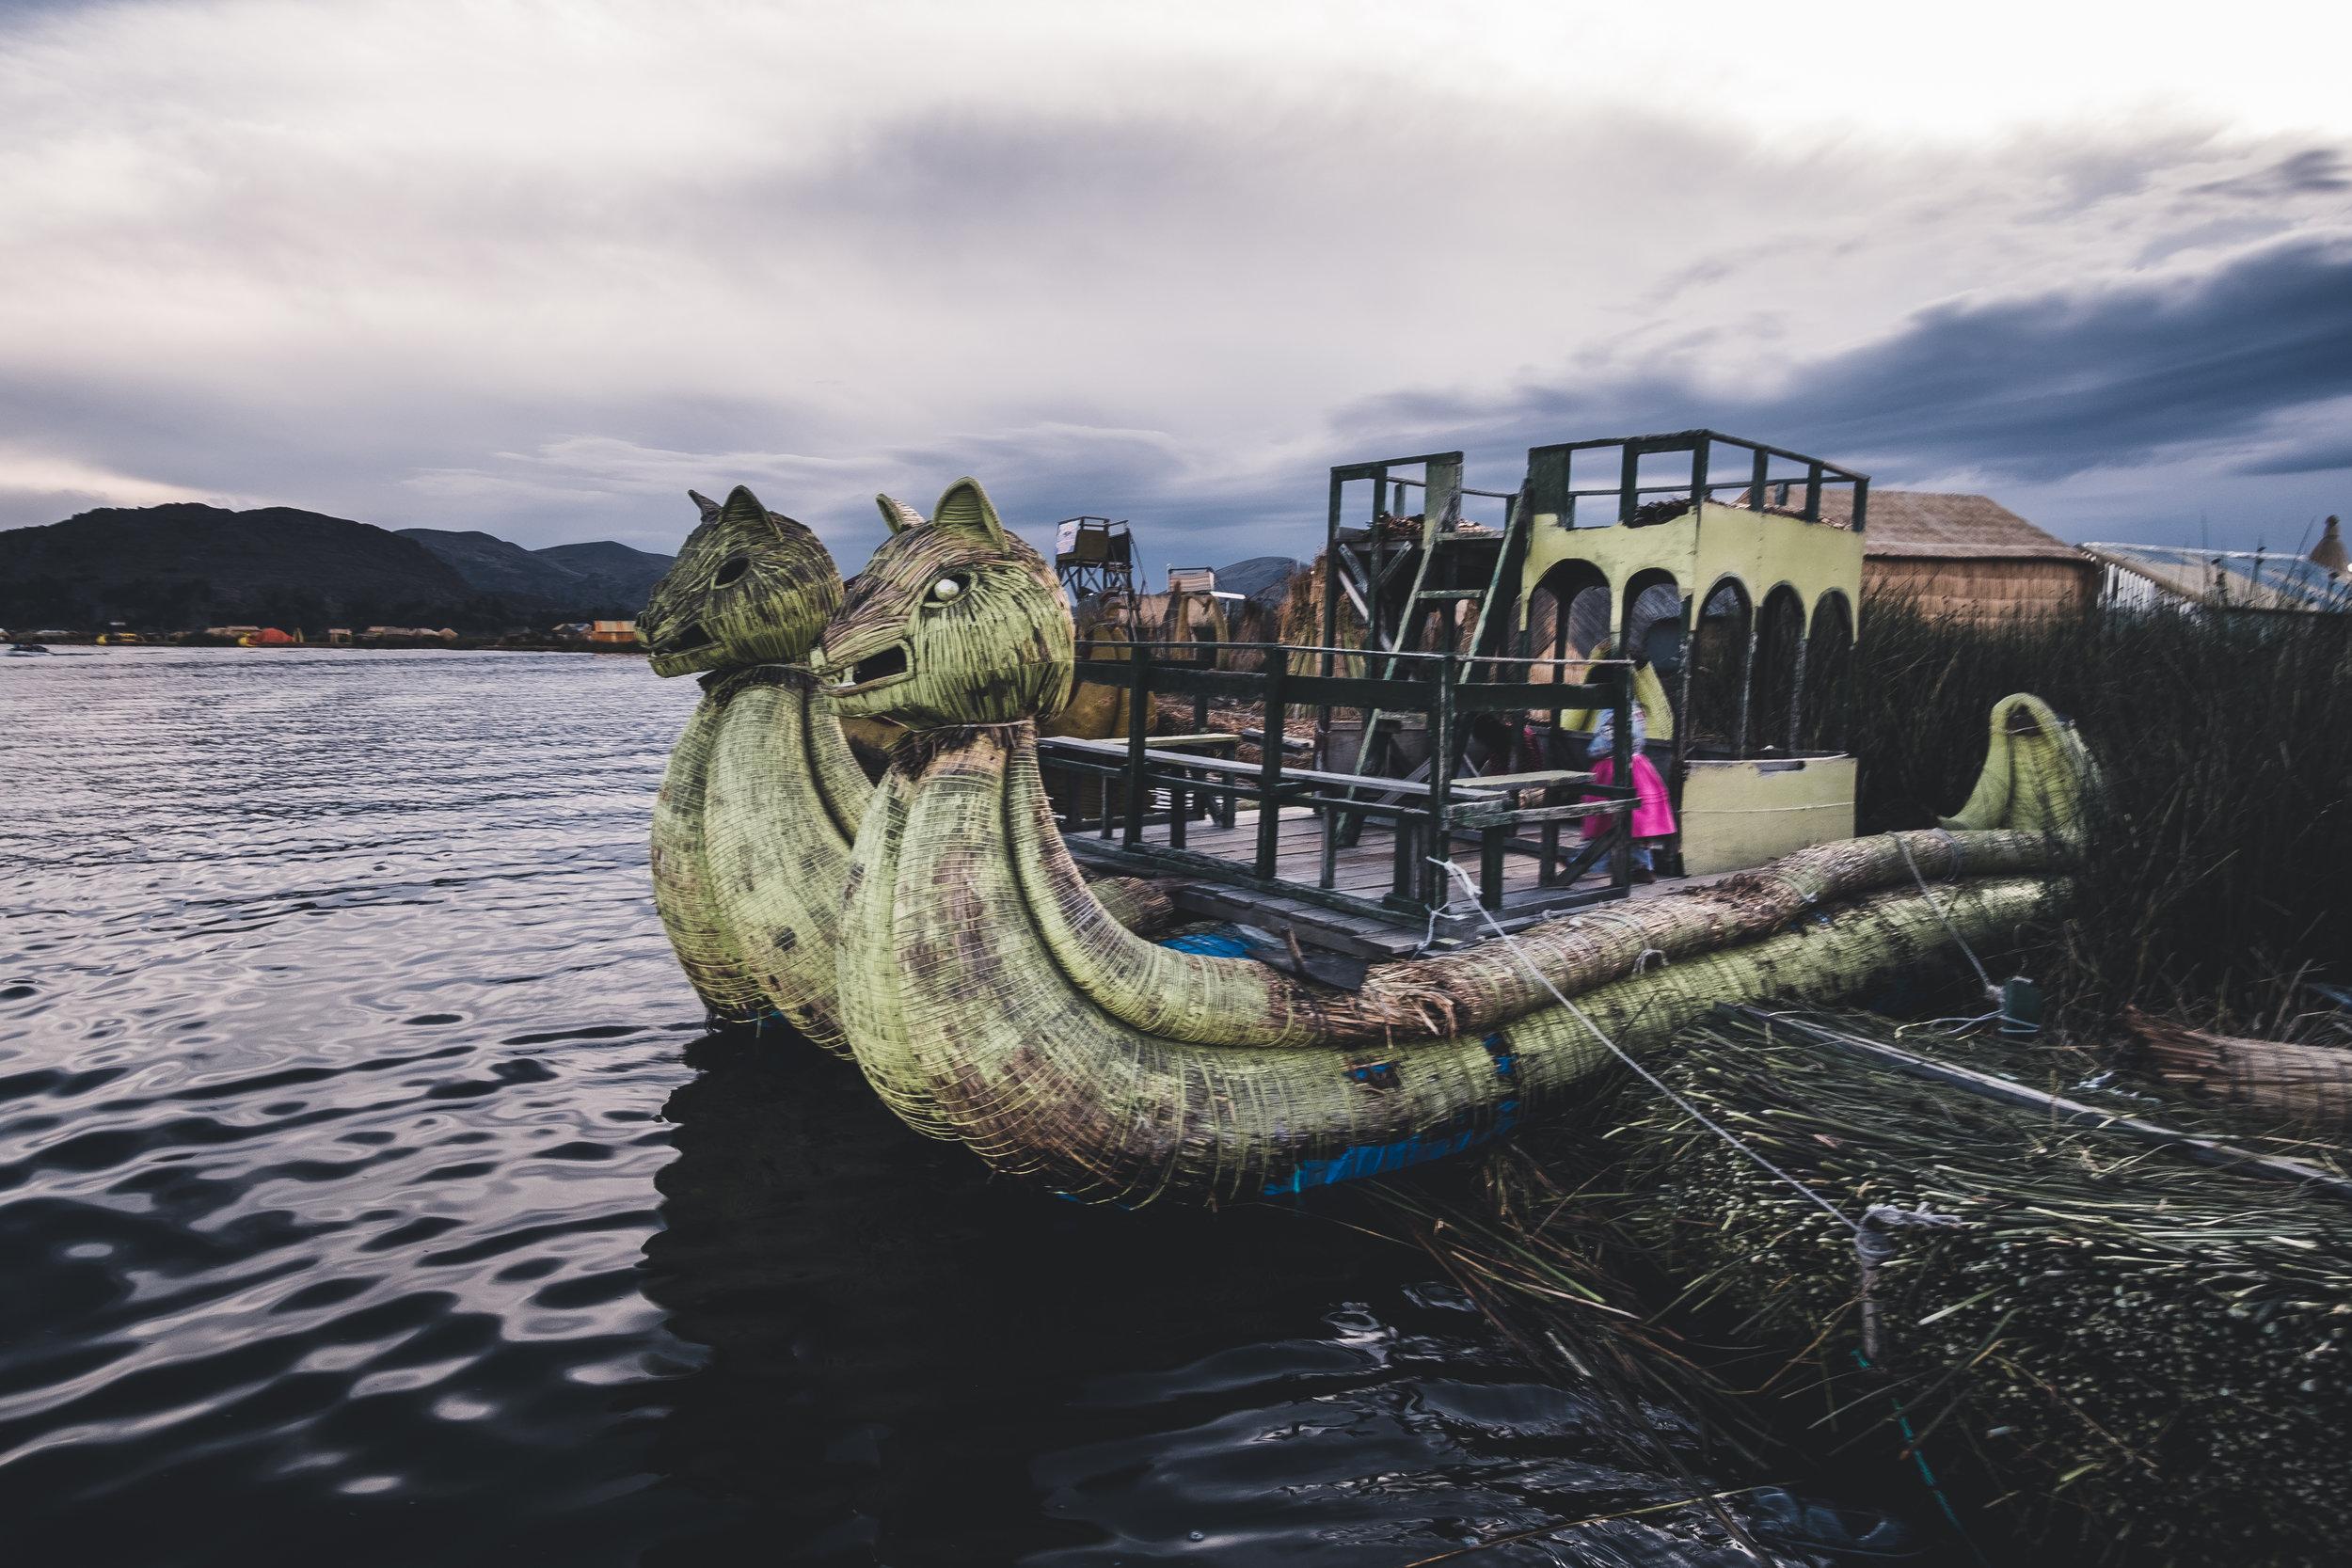 Floating islands | Titicaca lake, Puno